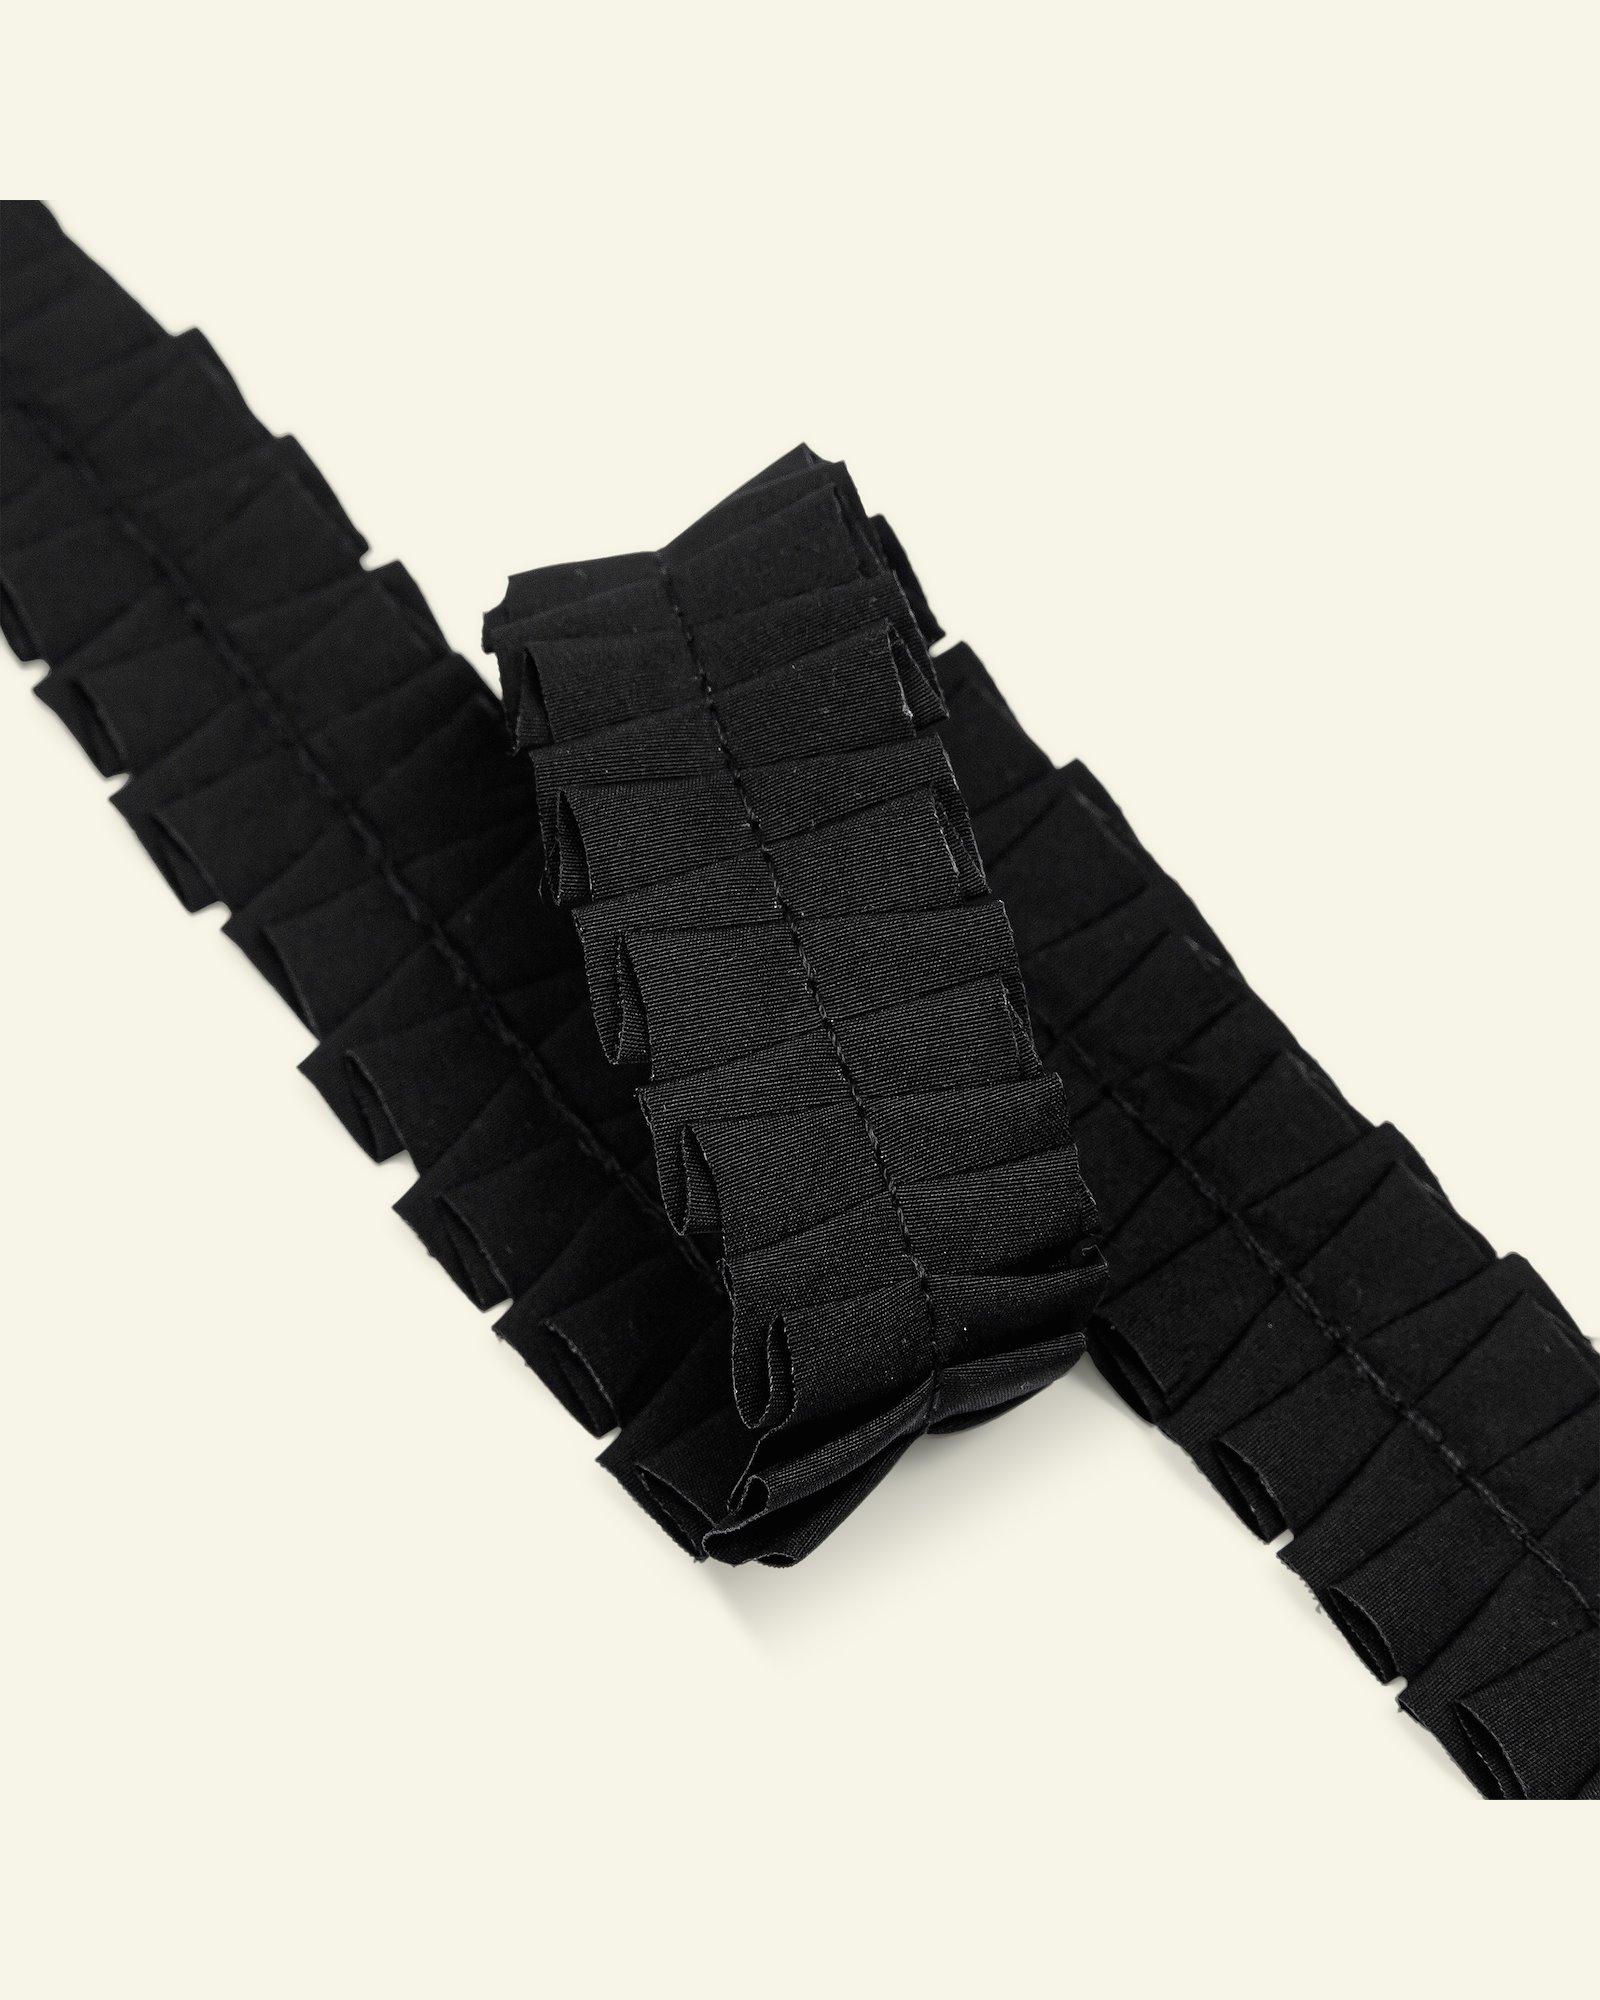 Ribbon ruffle 25mm black 2m